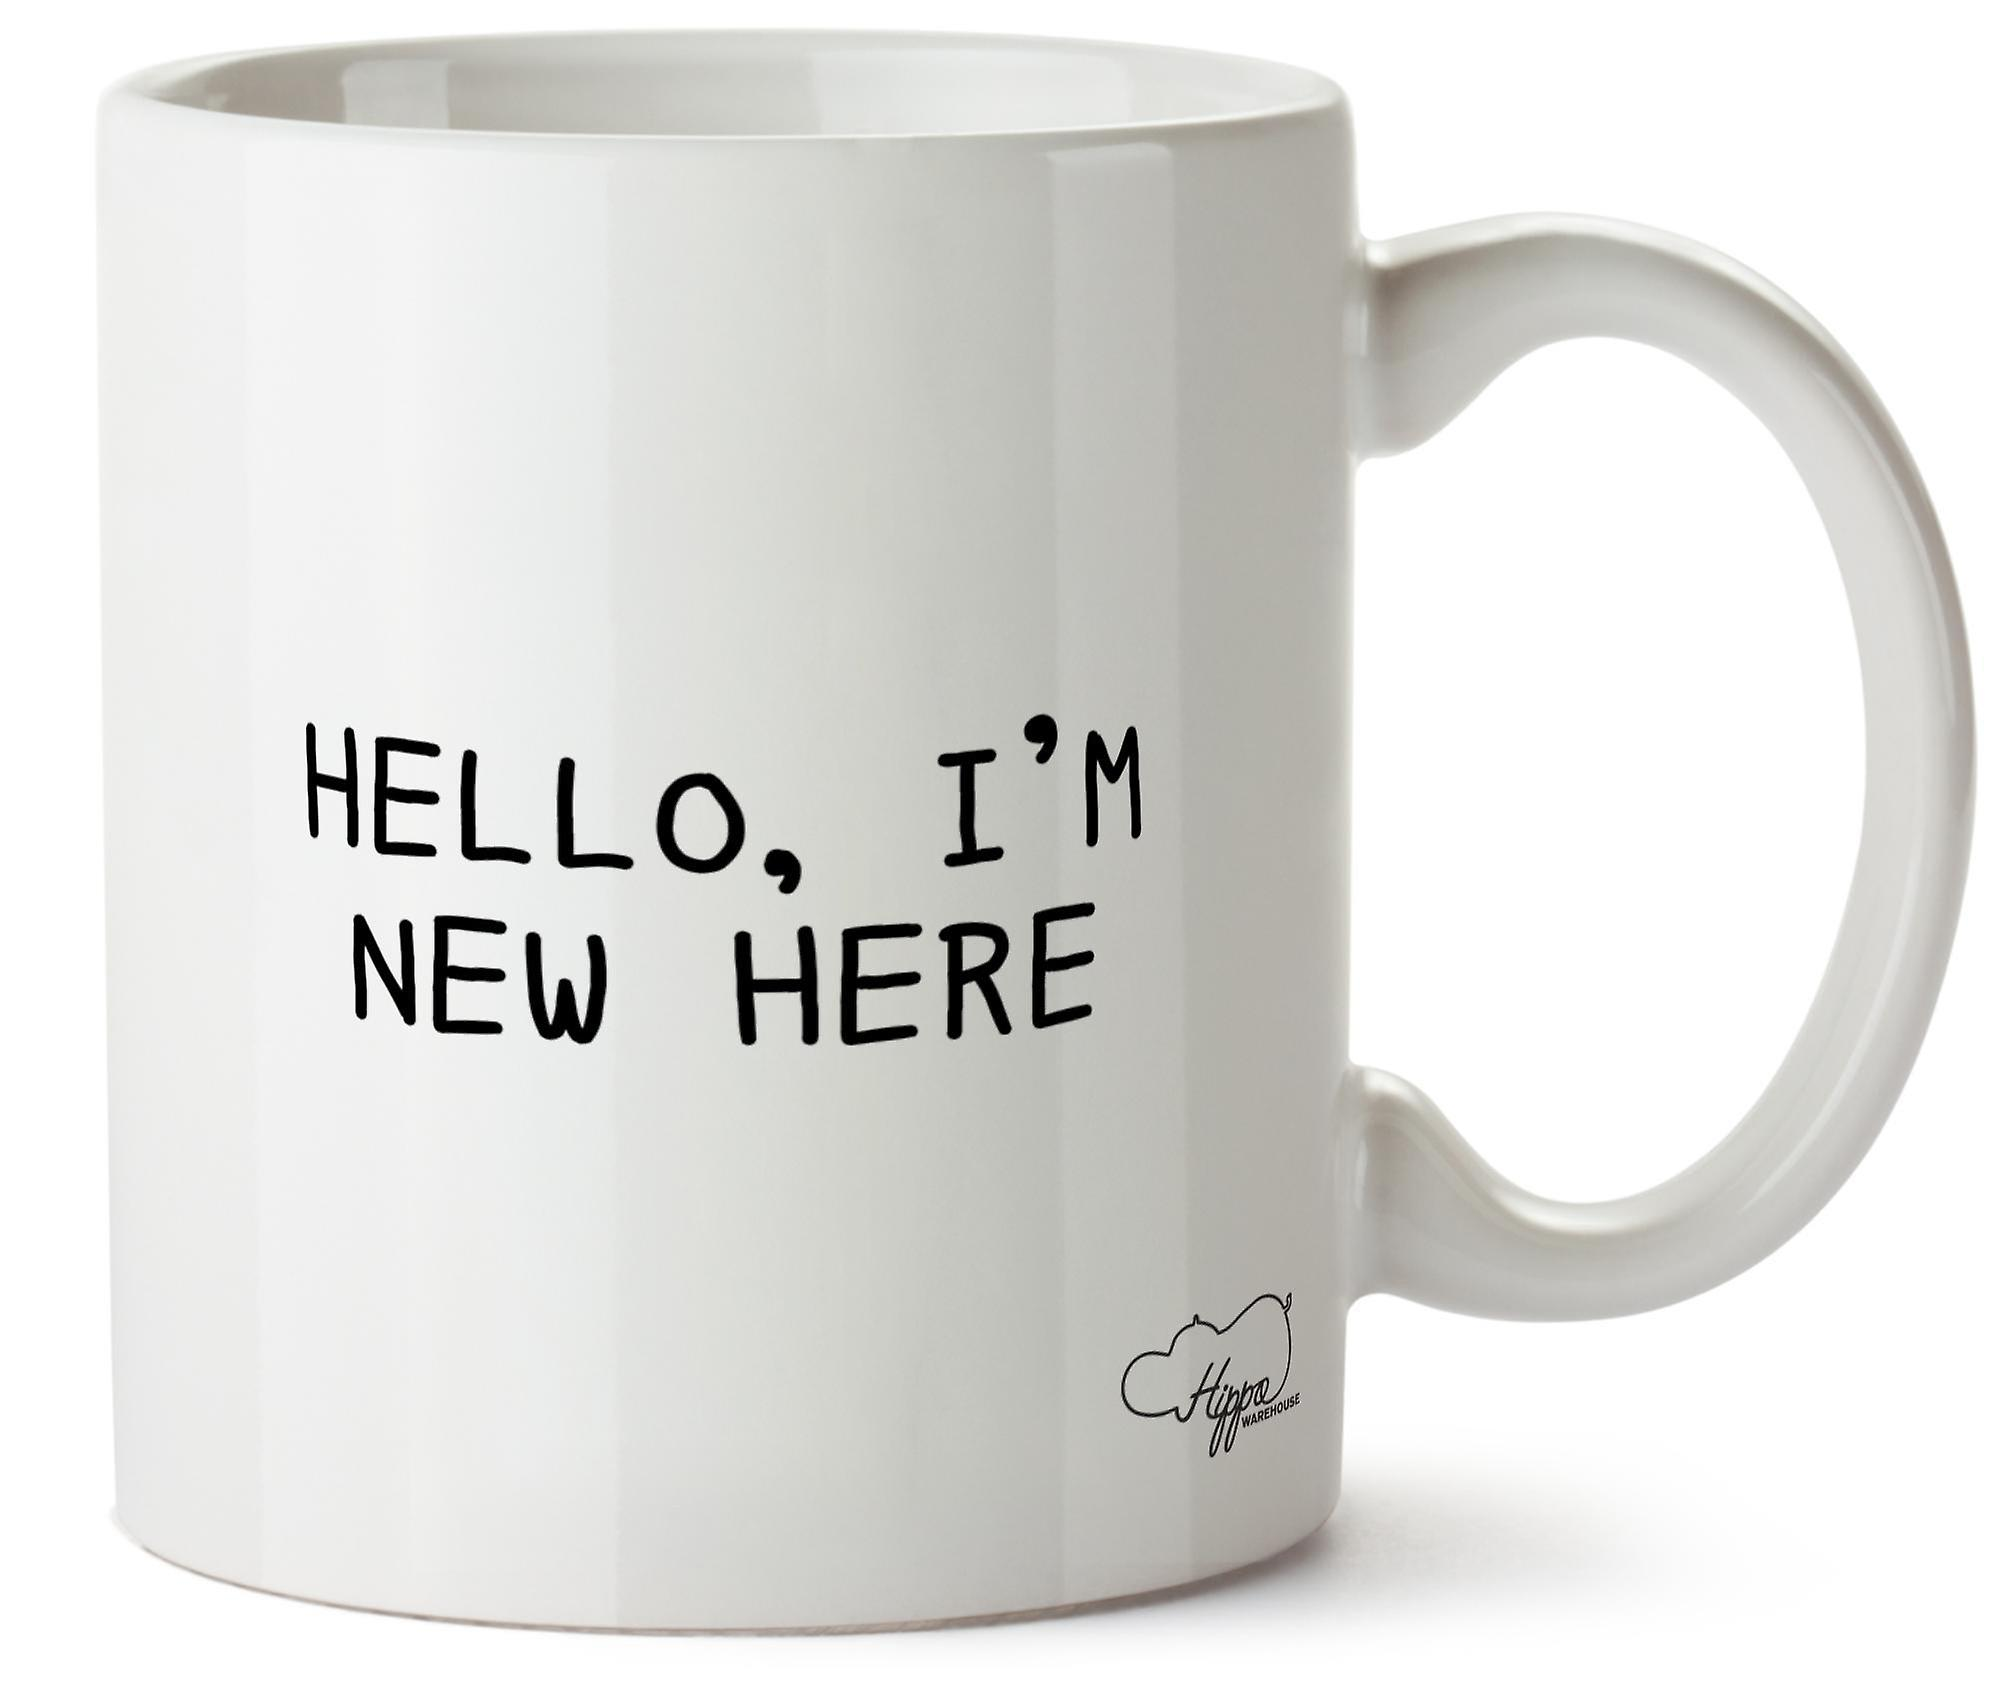 Hippowarehouse Hello, I'm New Here Printed Mug Cup Ceramic 10oz